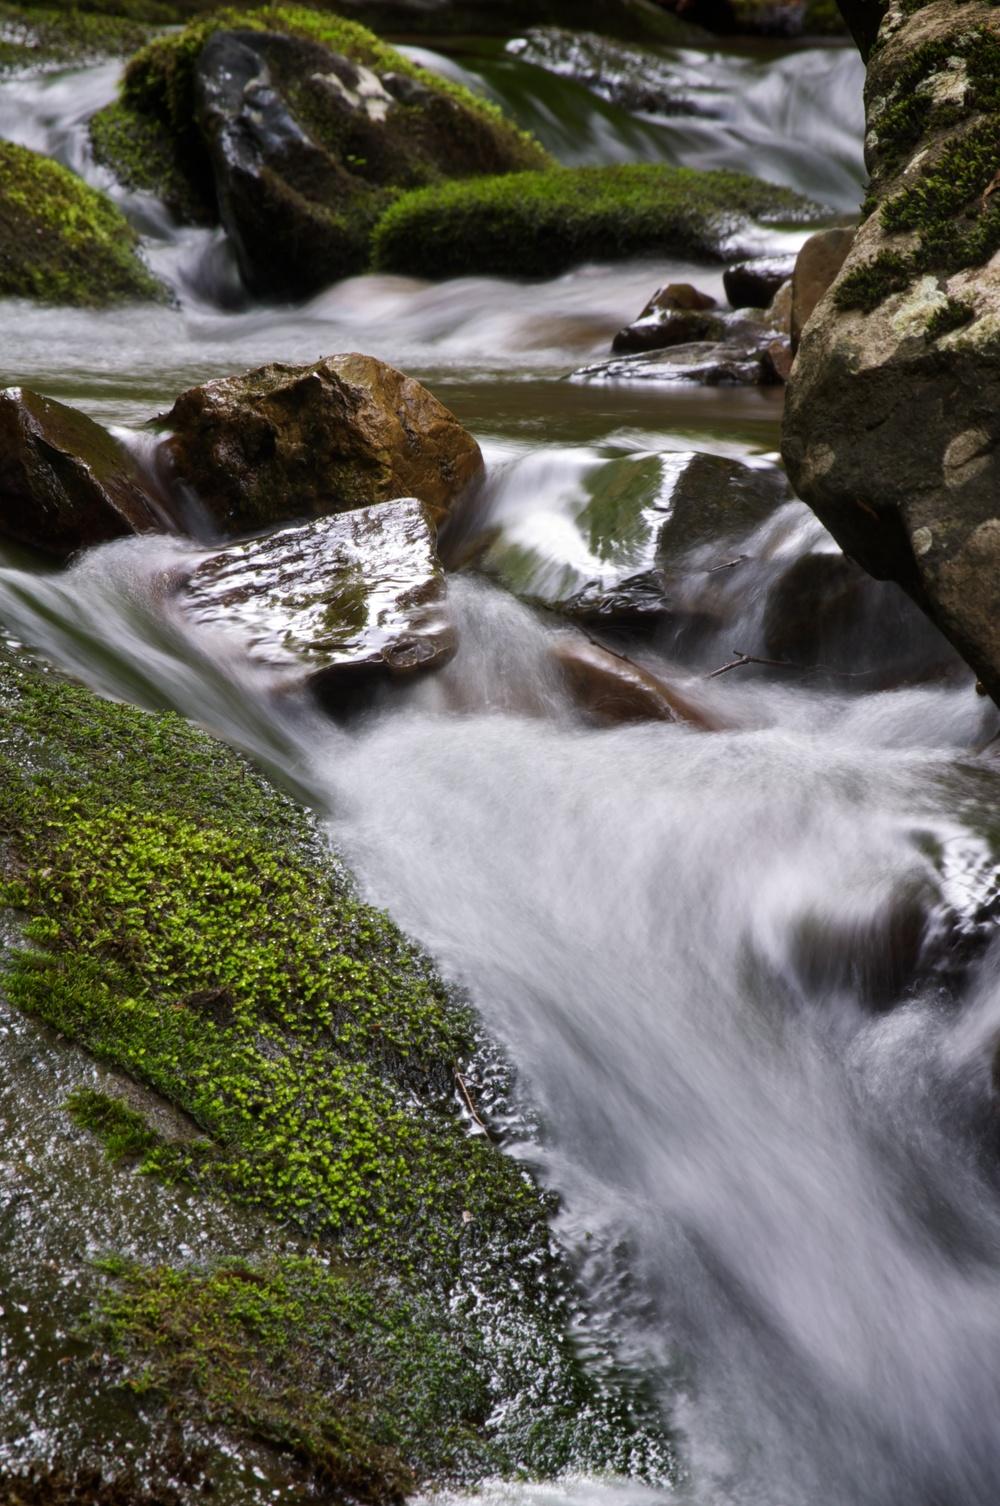 nature, stream, creek, river, water, moss